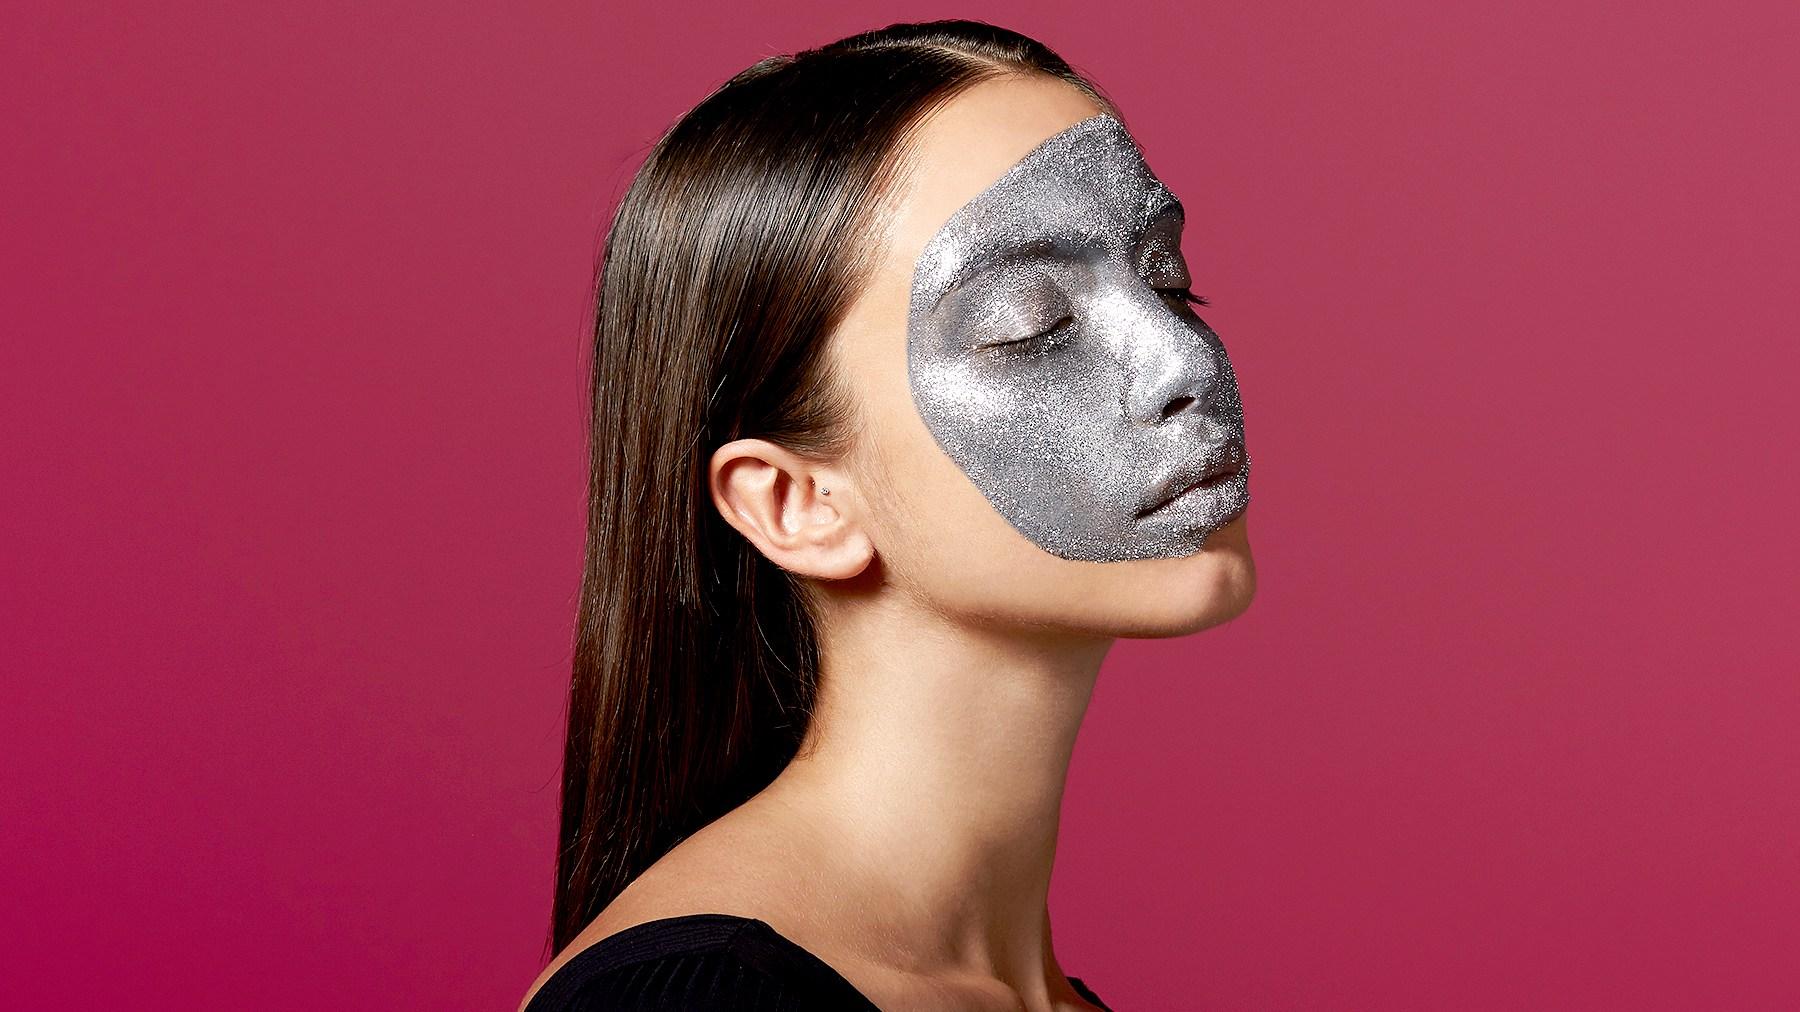 silver-face-mask-4ecbaefd-ae18-48bf-8ec6-15bb7728c08a